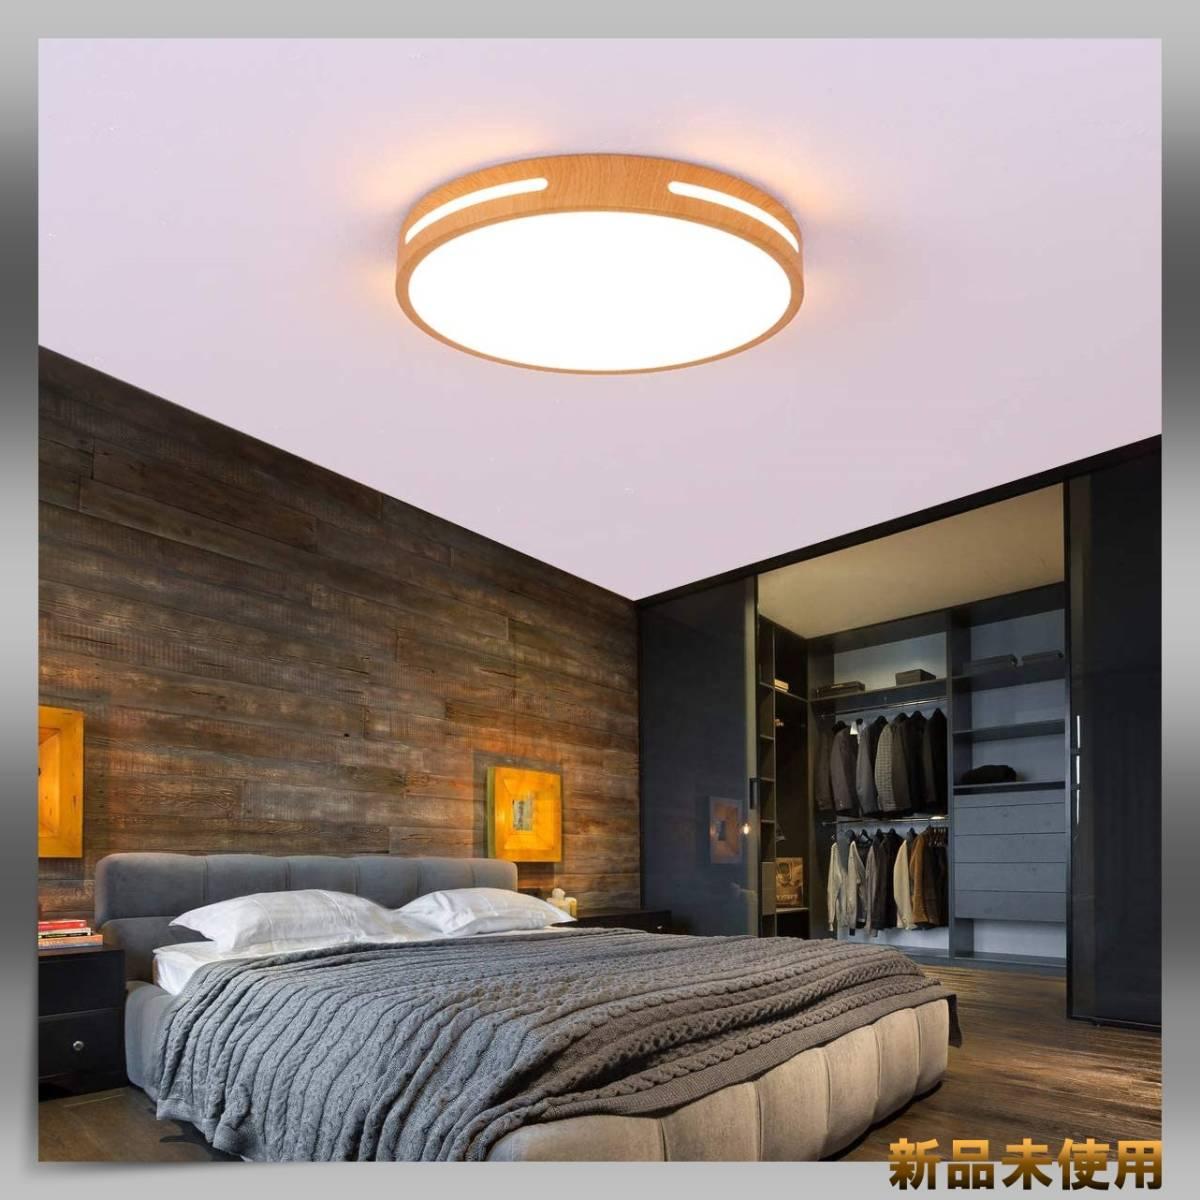 LEDシーリングライト 30W 天井照明器具 木目調 和風 薄型 シーリングライト 無段階調光調色 リモコン付き_画像7